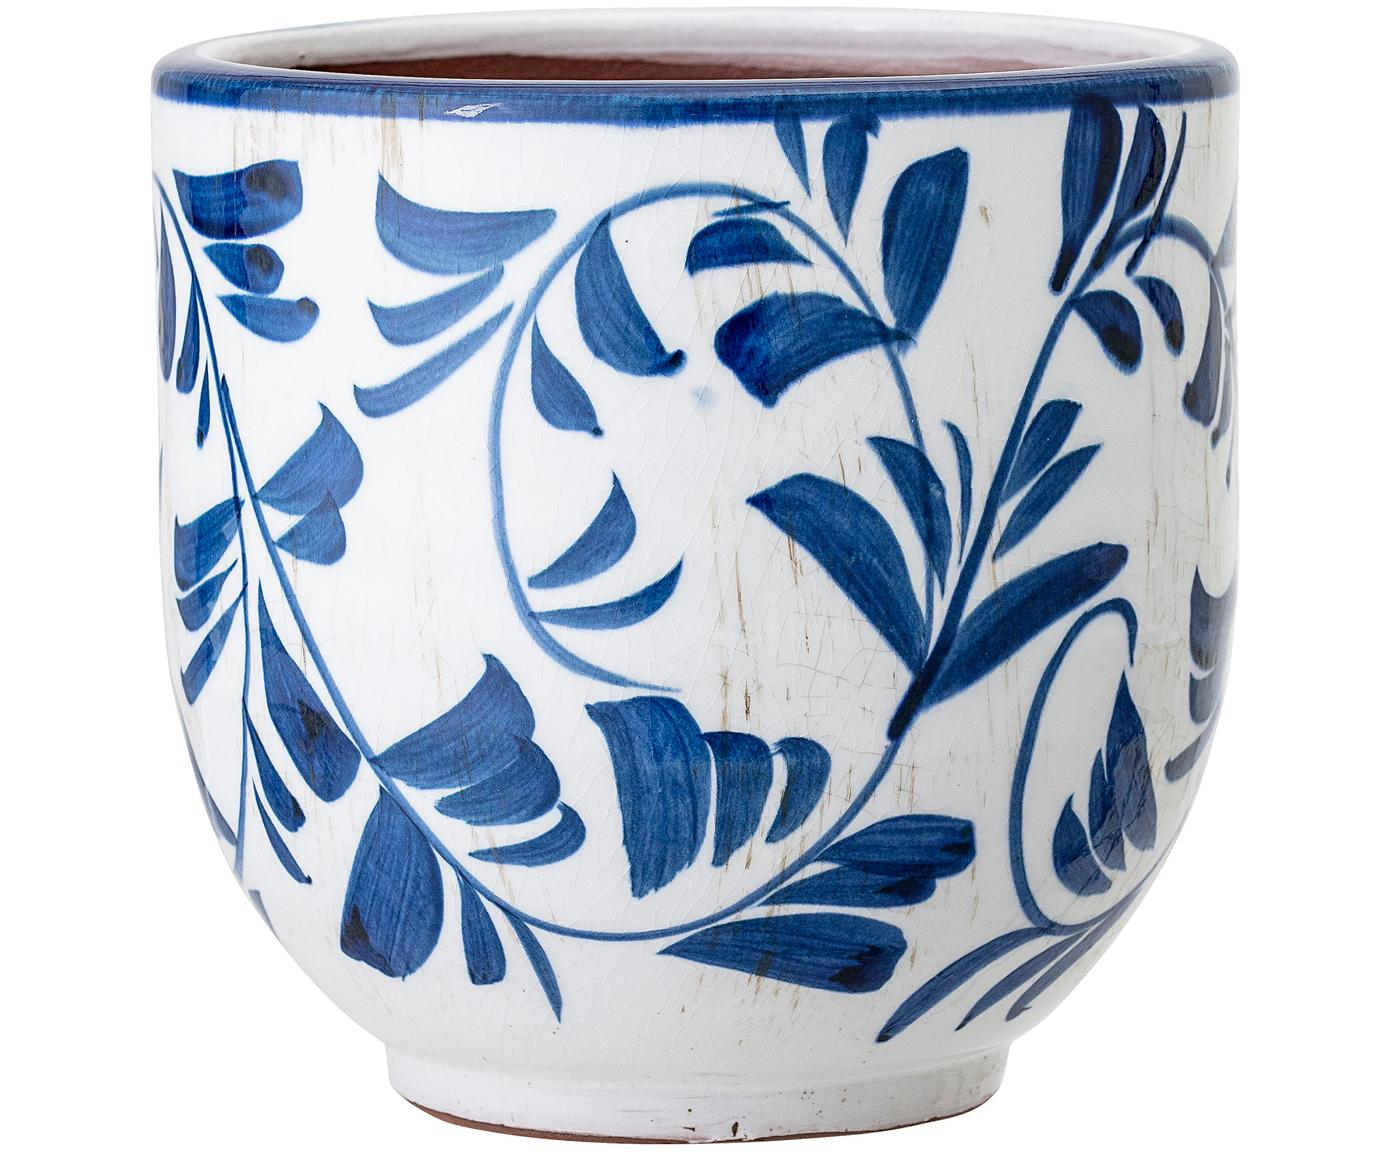 Übertopf Jarl, Terracotta, Blau, Weiß, Ø 14 x H 14 cm